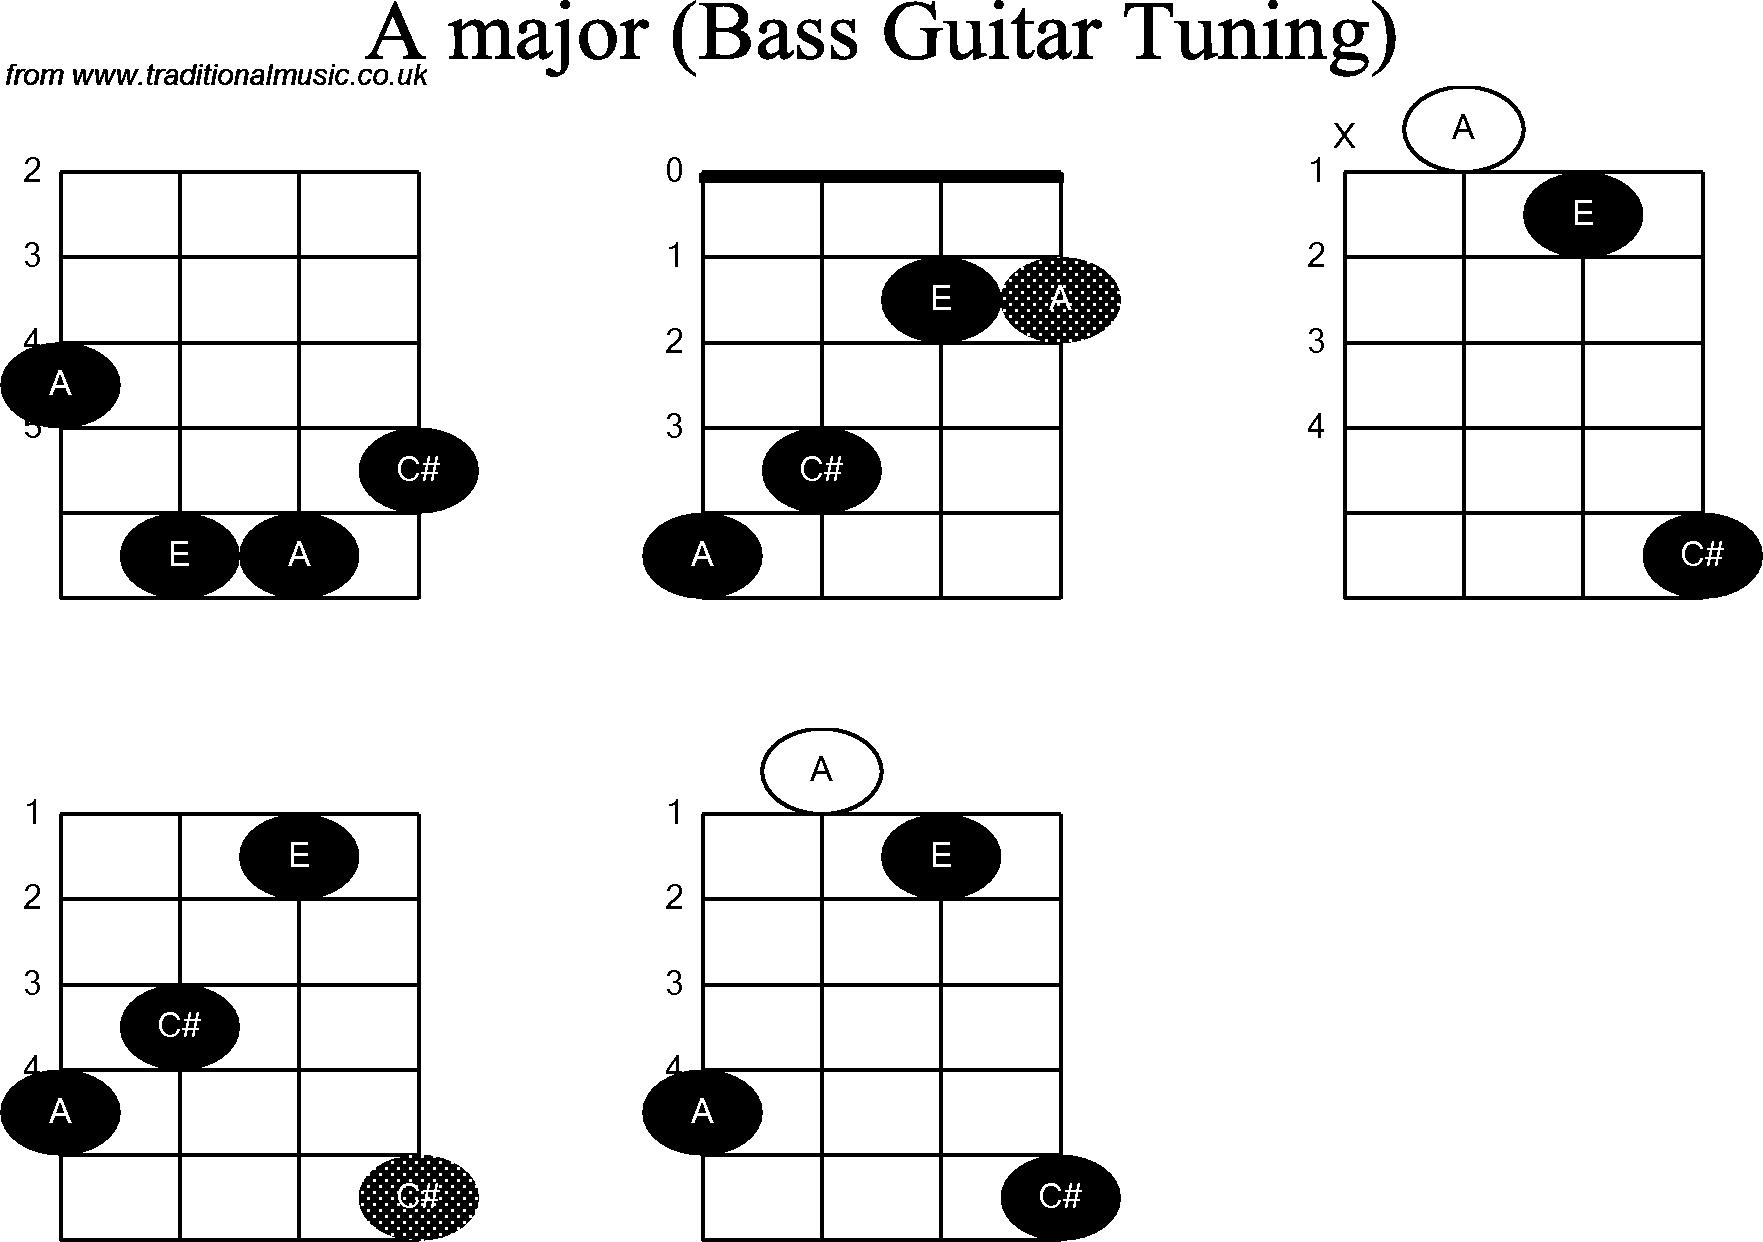 Bass Guitar Chord Diagrams For: A - Free Printable Bass Guitar Chord Chart